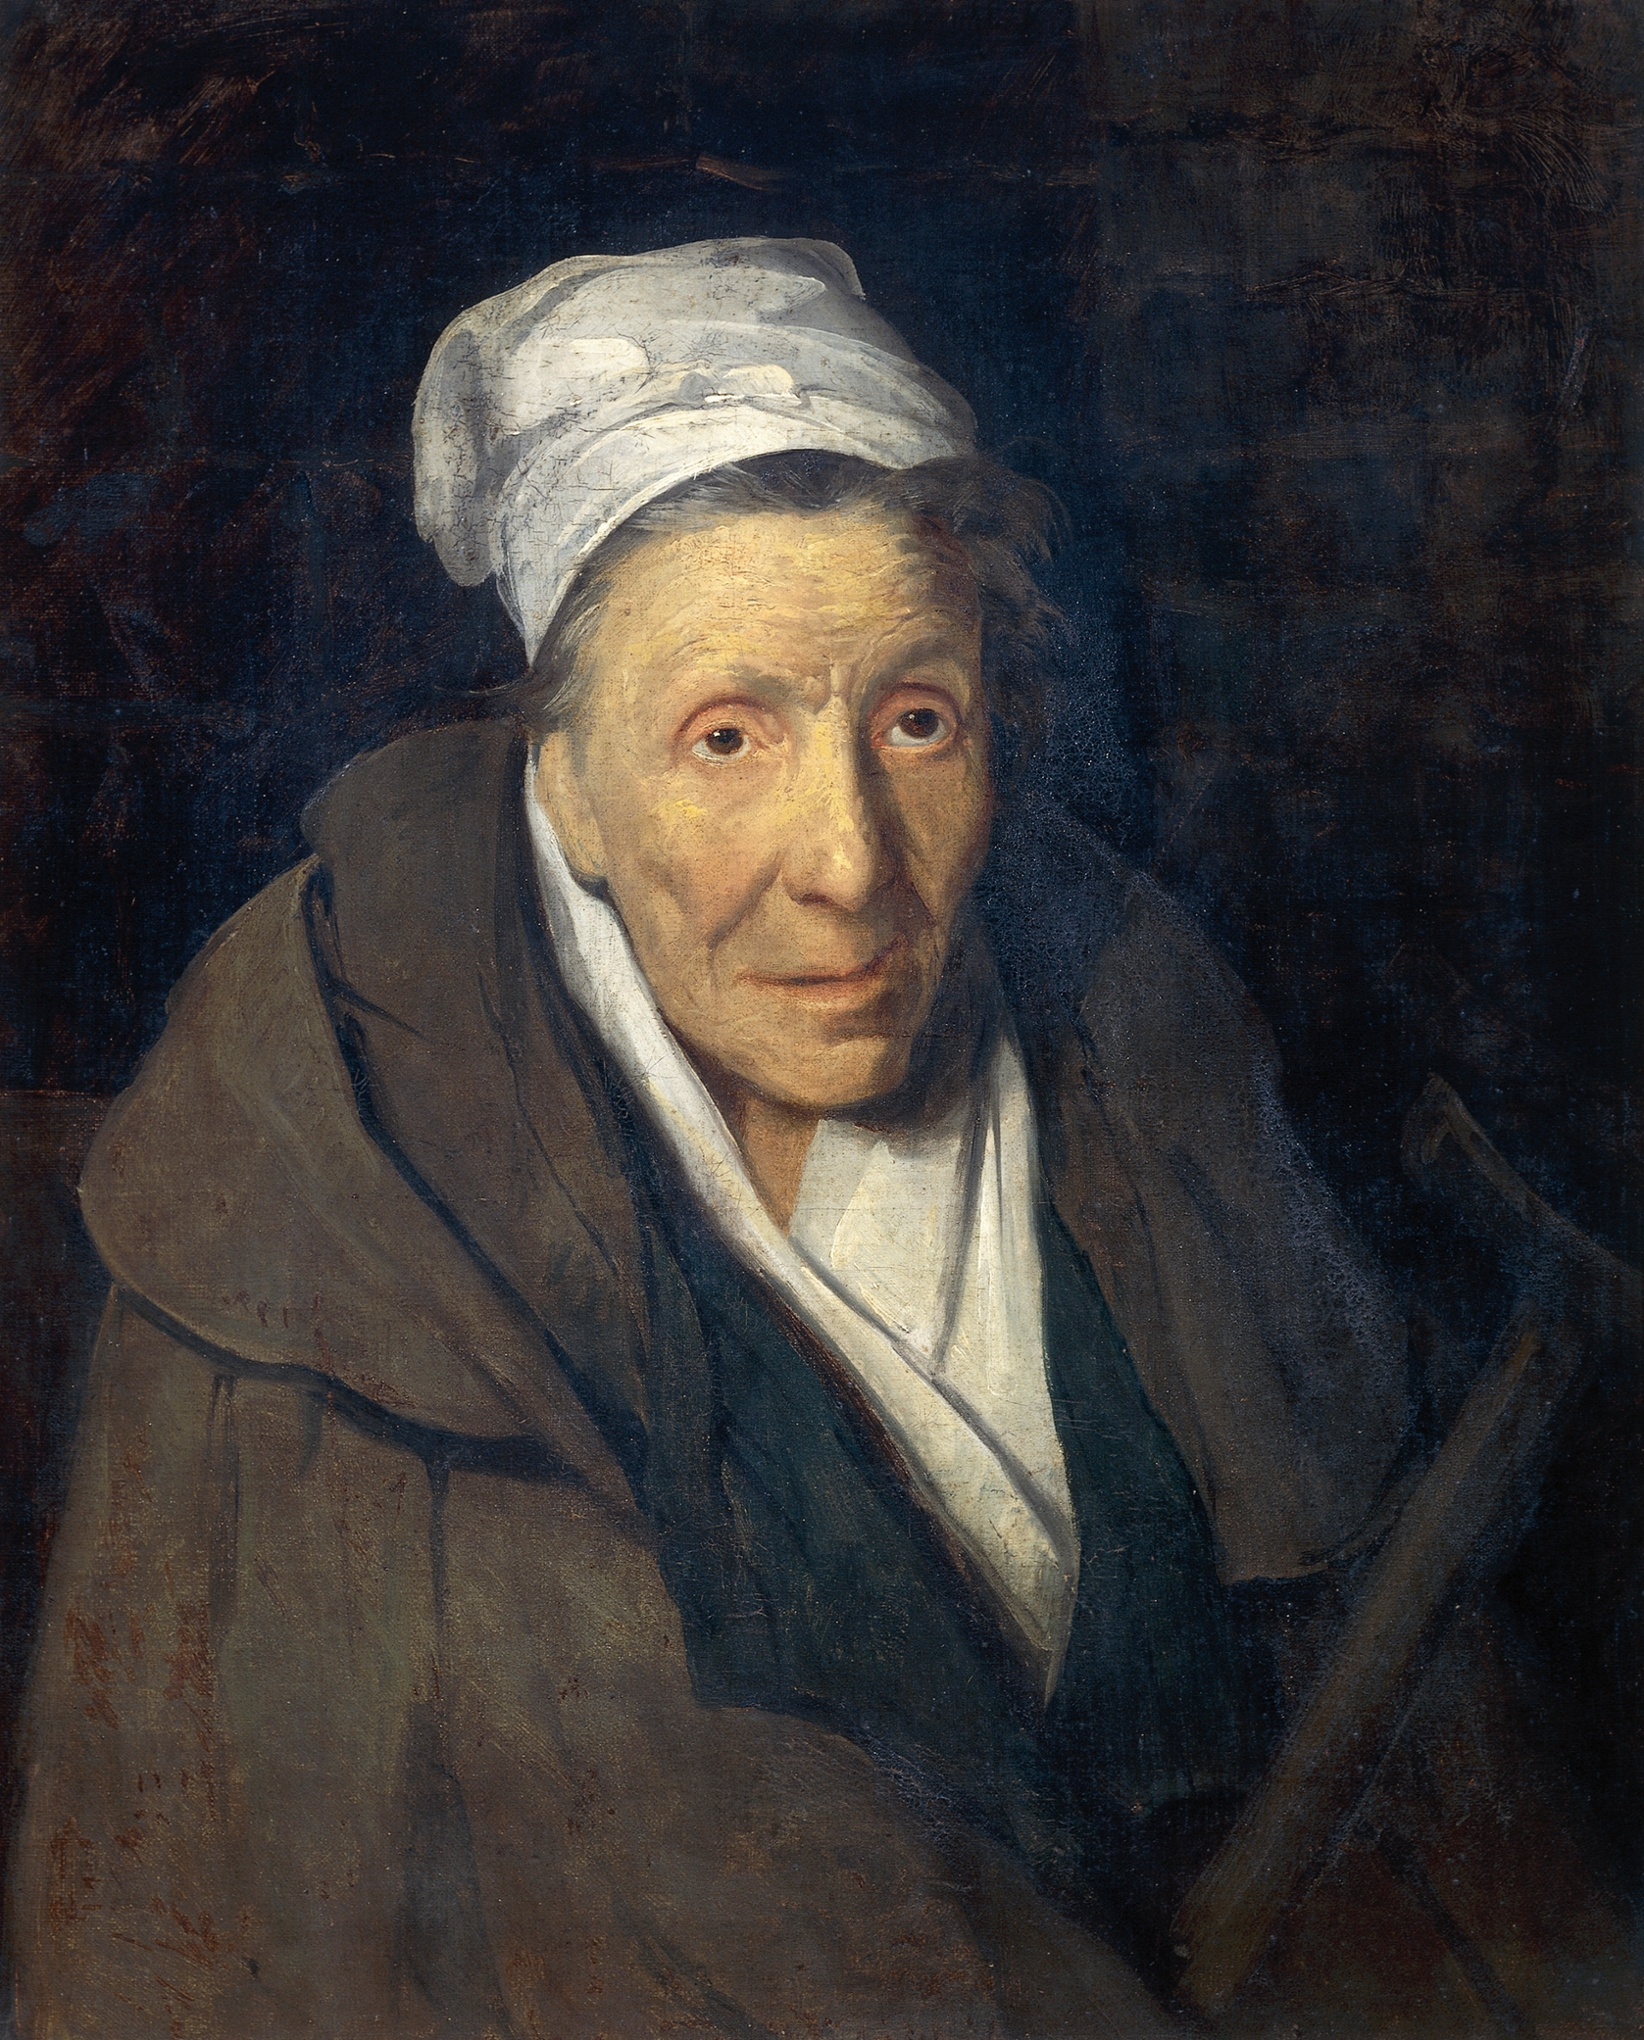 Theodore Gericault – Portraits of the Insane (1822)